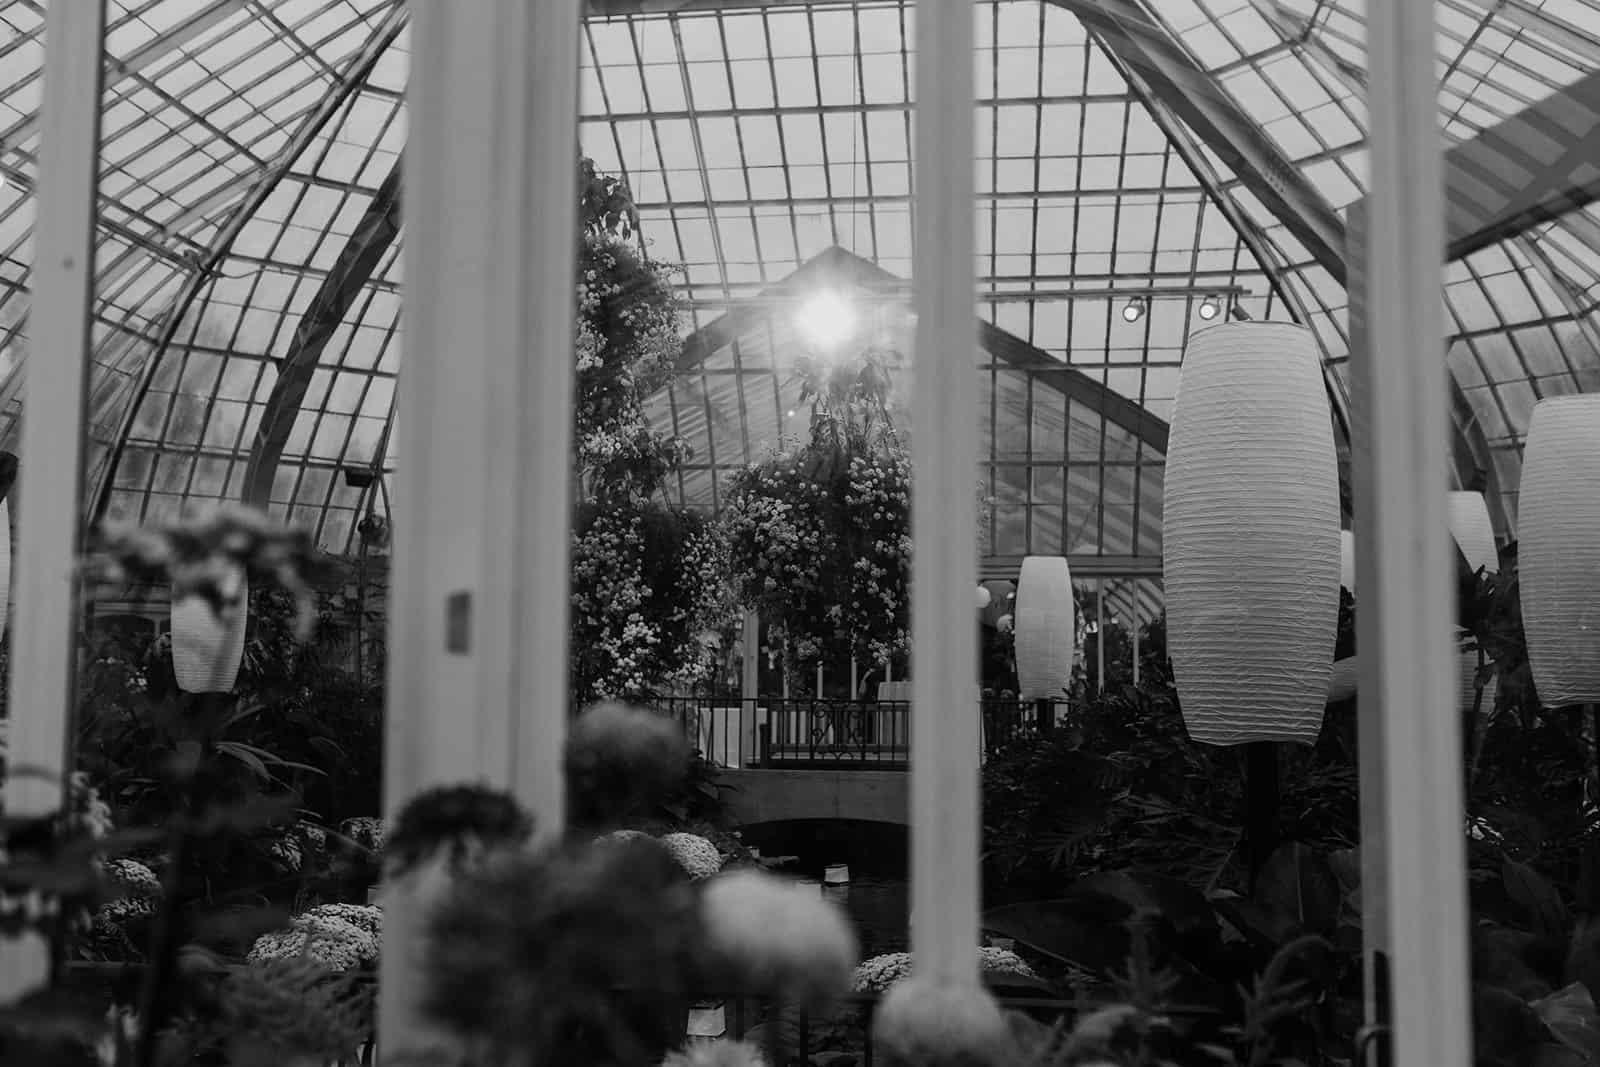 spotlight in a greenhouse